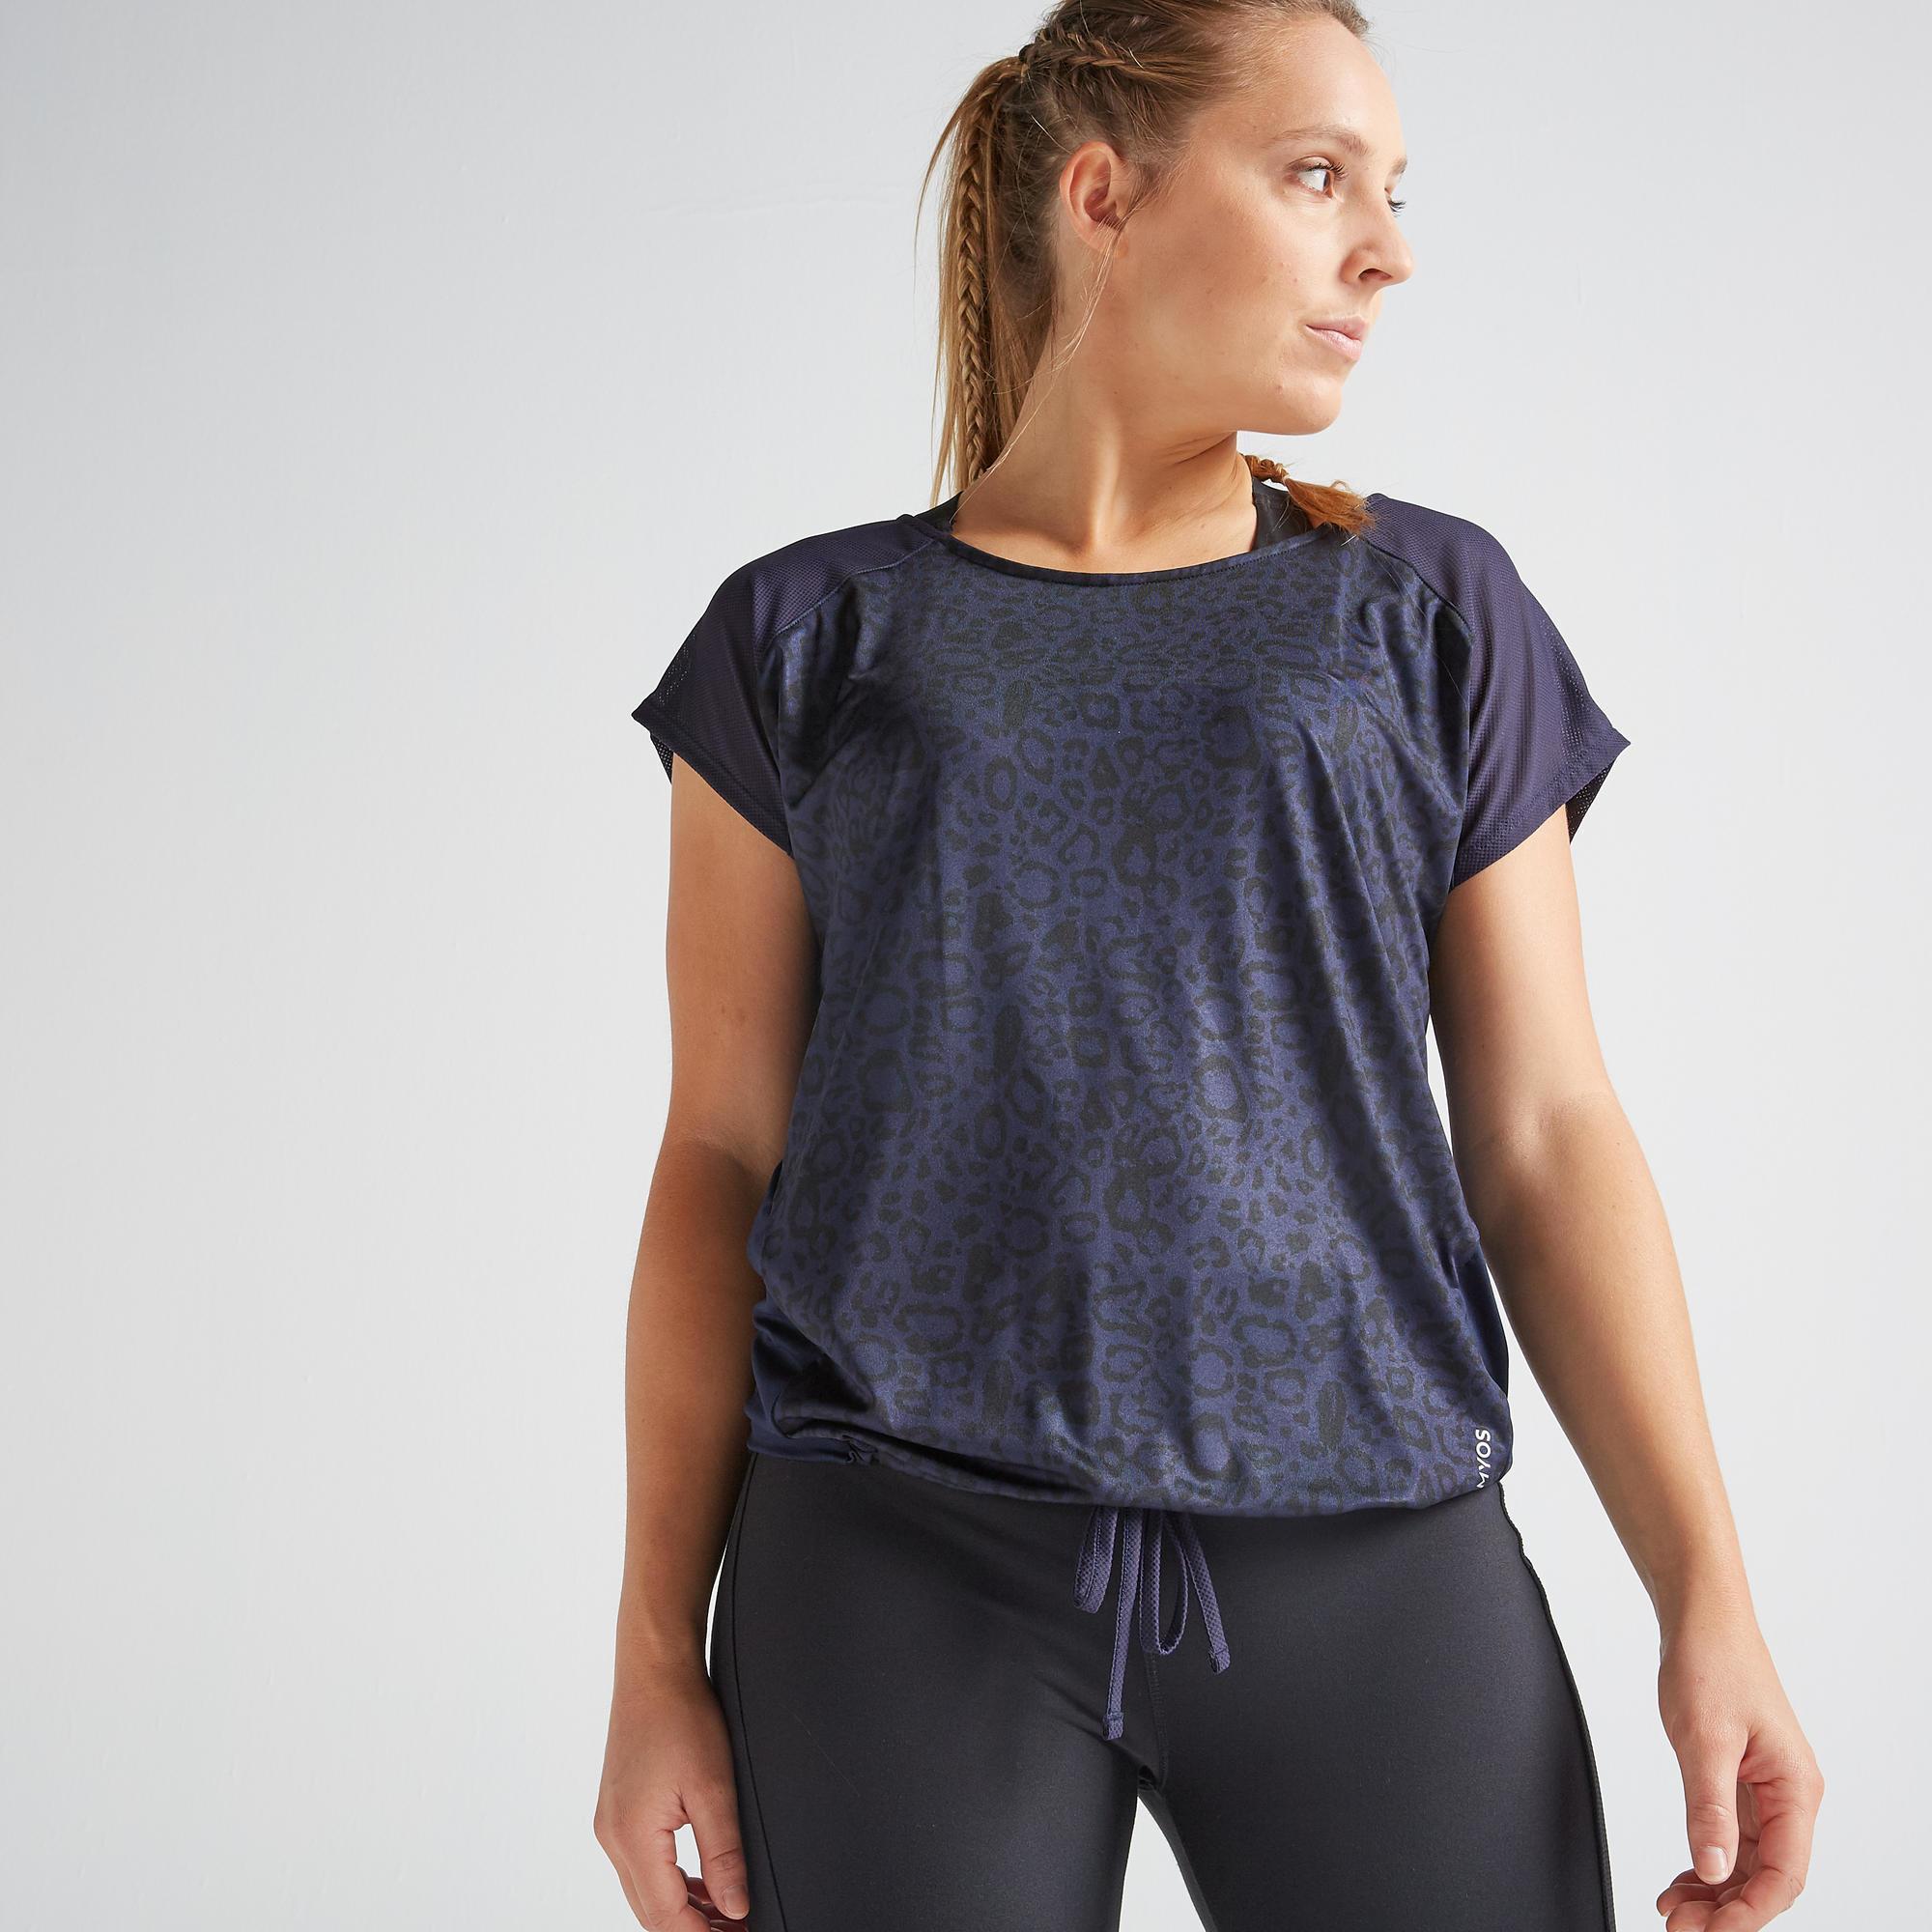 T-shirt fitness cardio training femme bleu marine imprimé 120 - Domyos